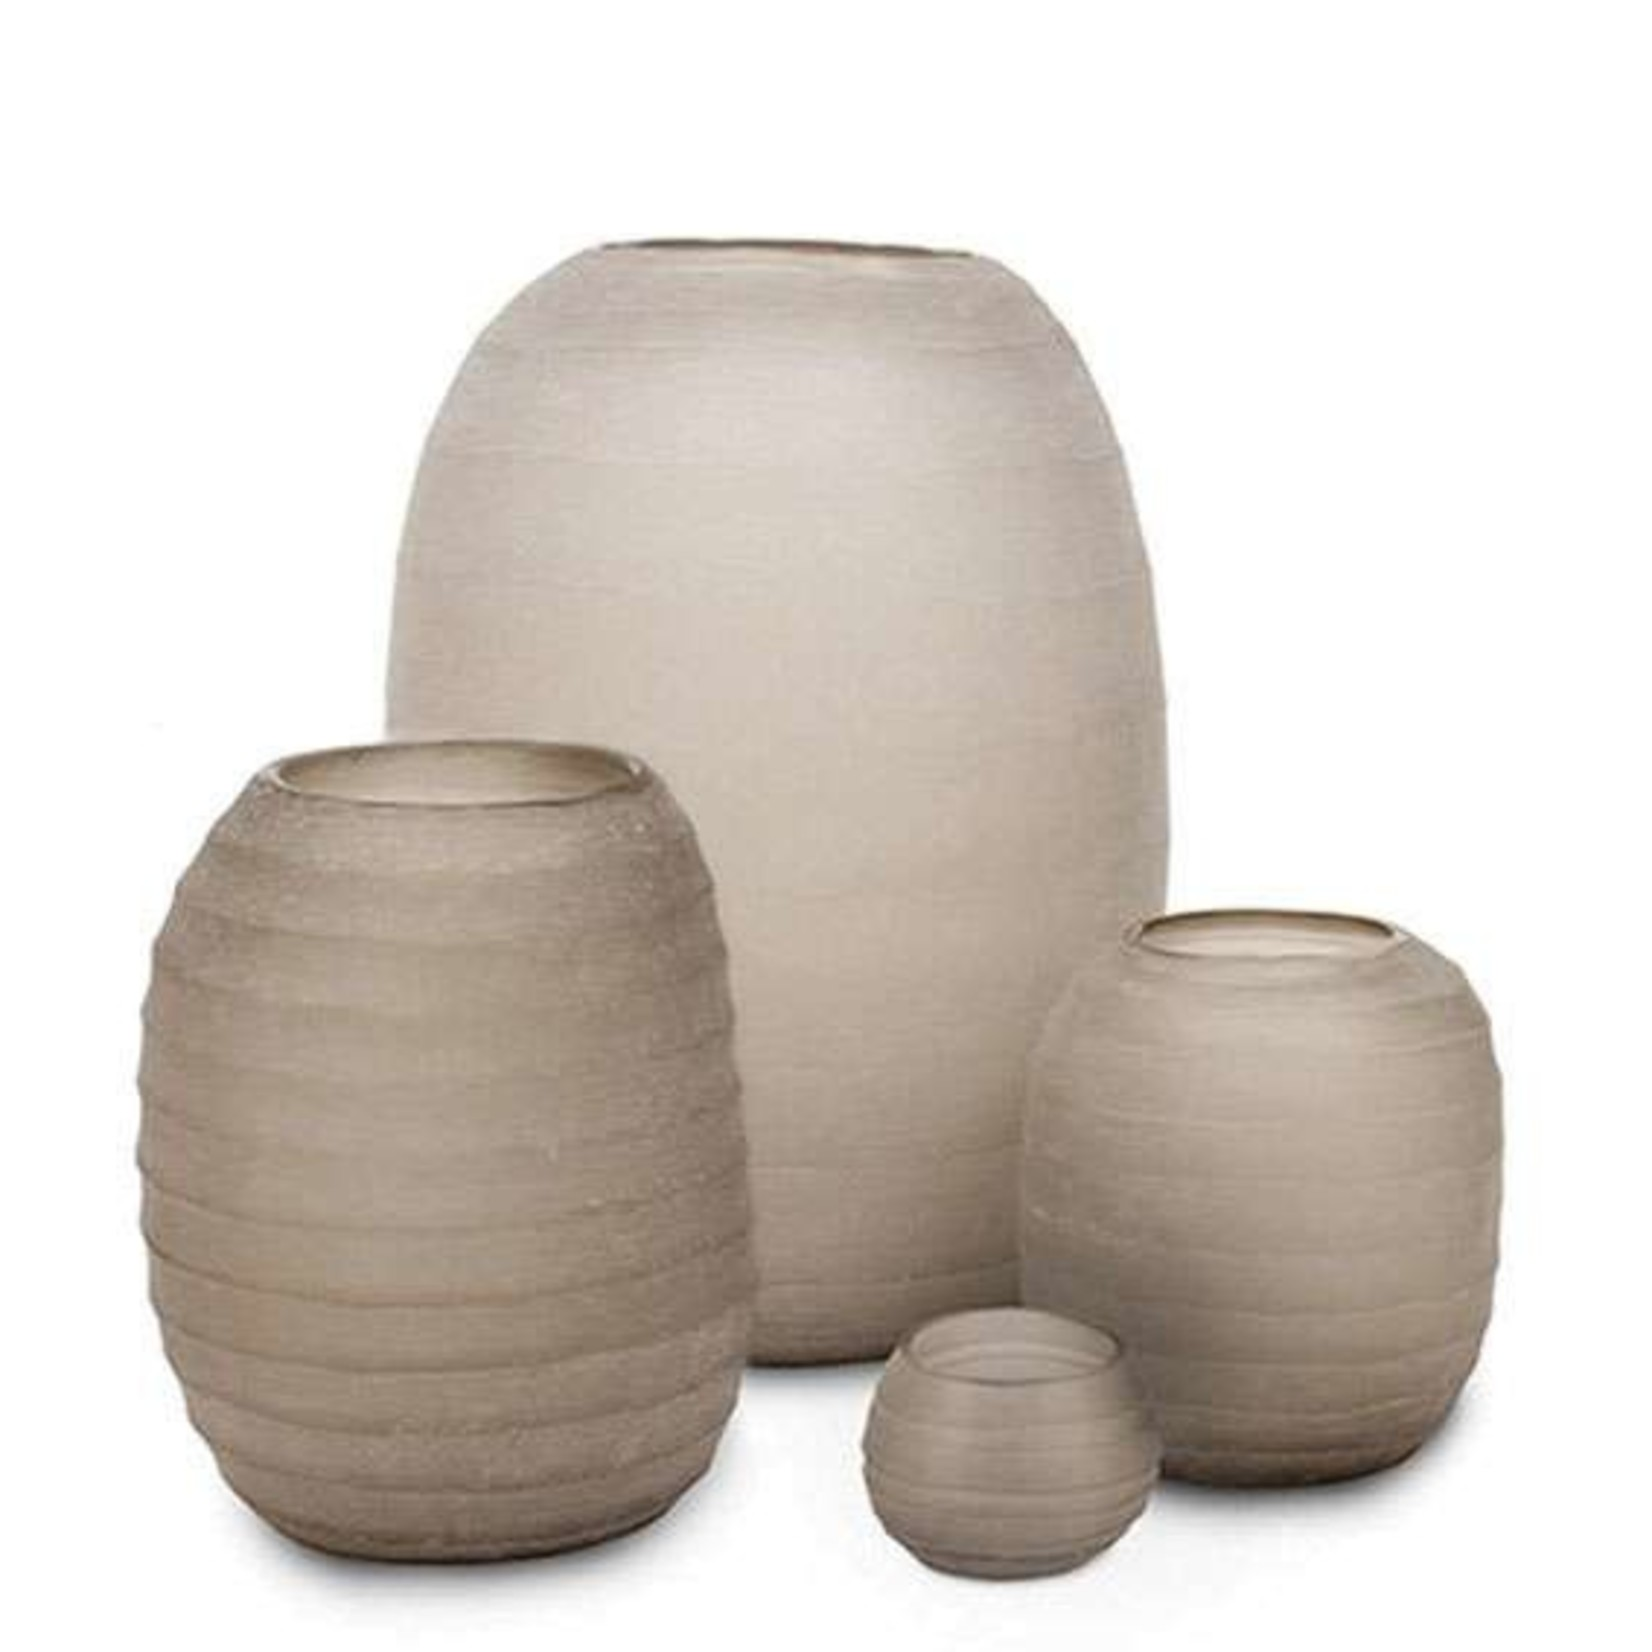 Guaxs Vase Belly Huge   smoke grey